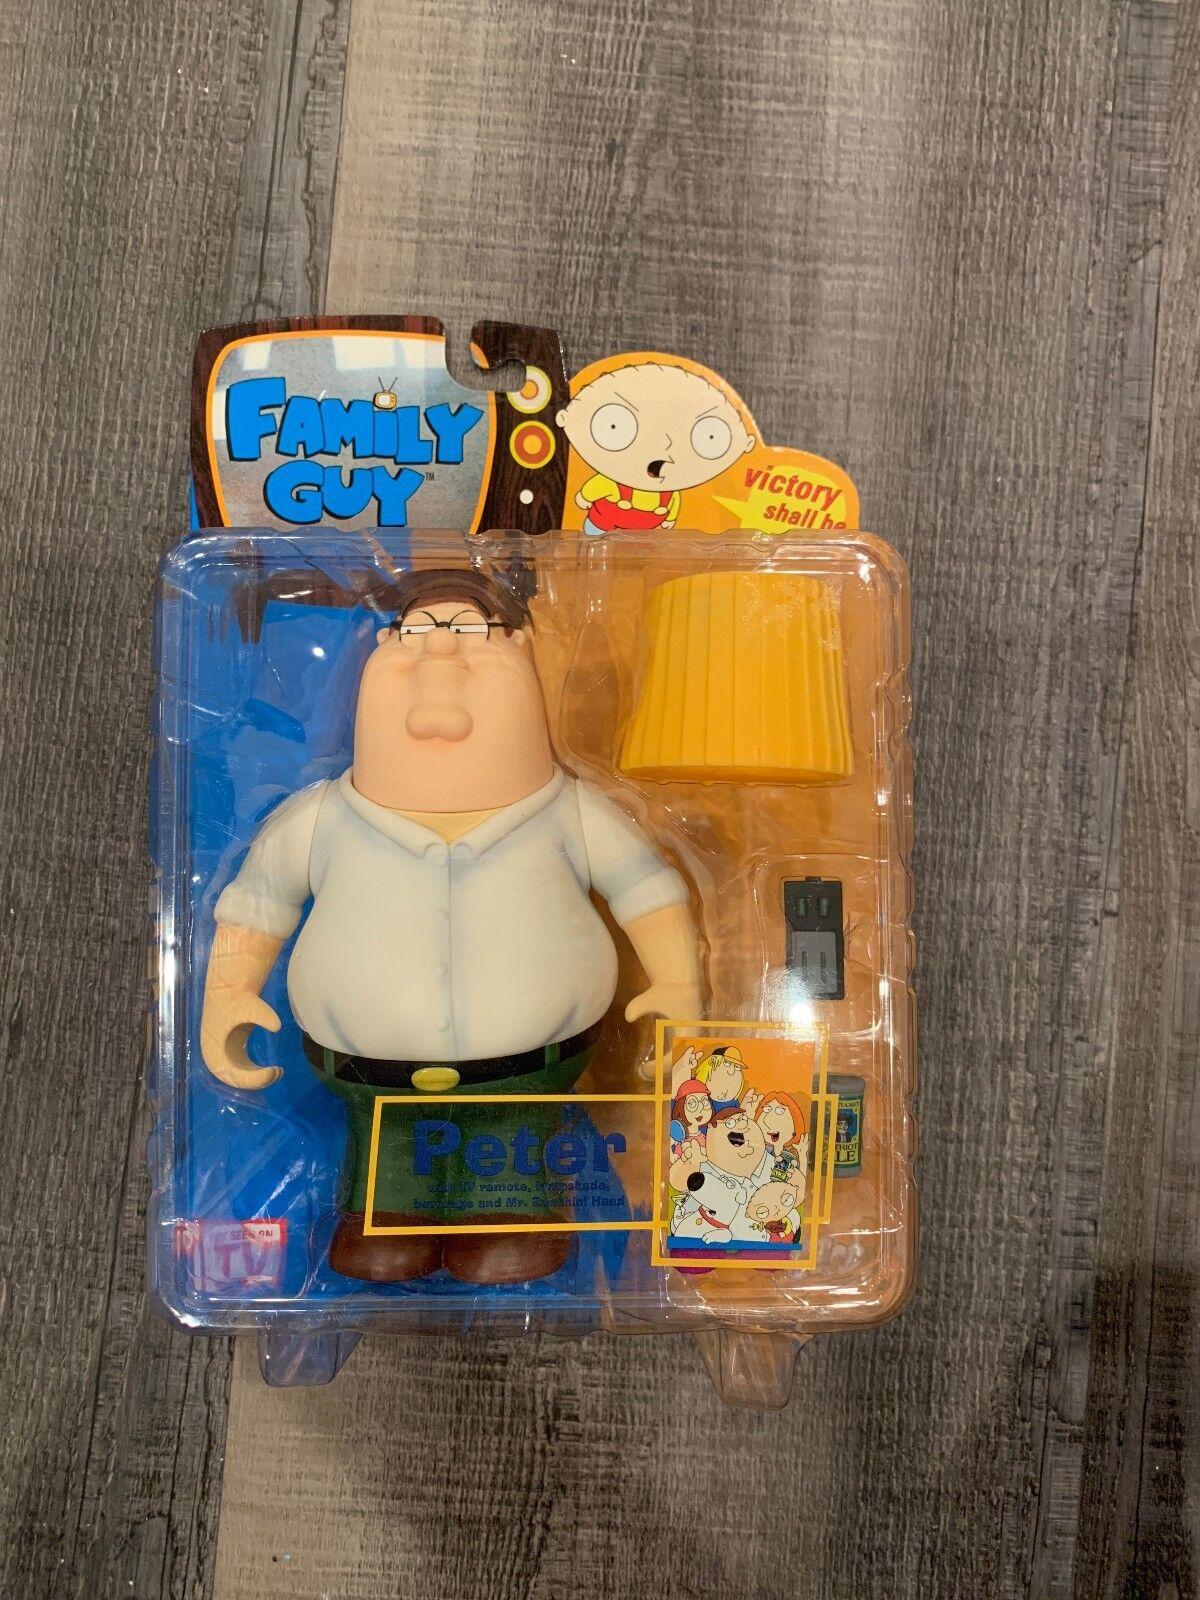 Mezco Family Guy Peter Griffin Series 1 1 1 Action Figure 2004 MOC RARE e26e1c